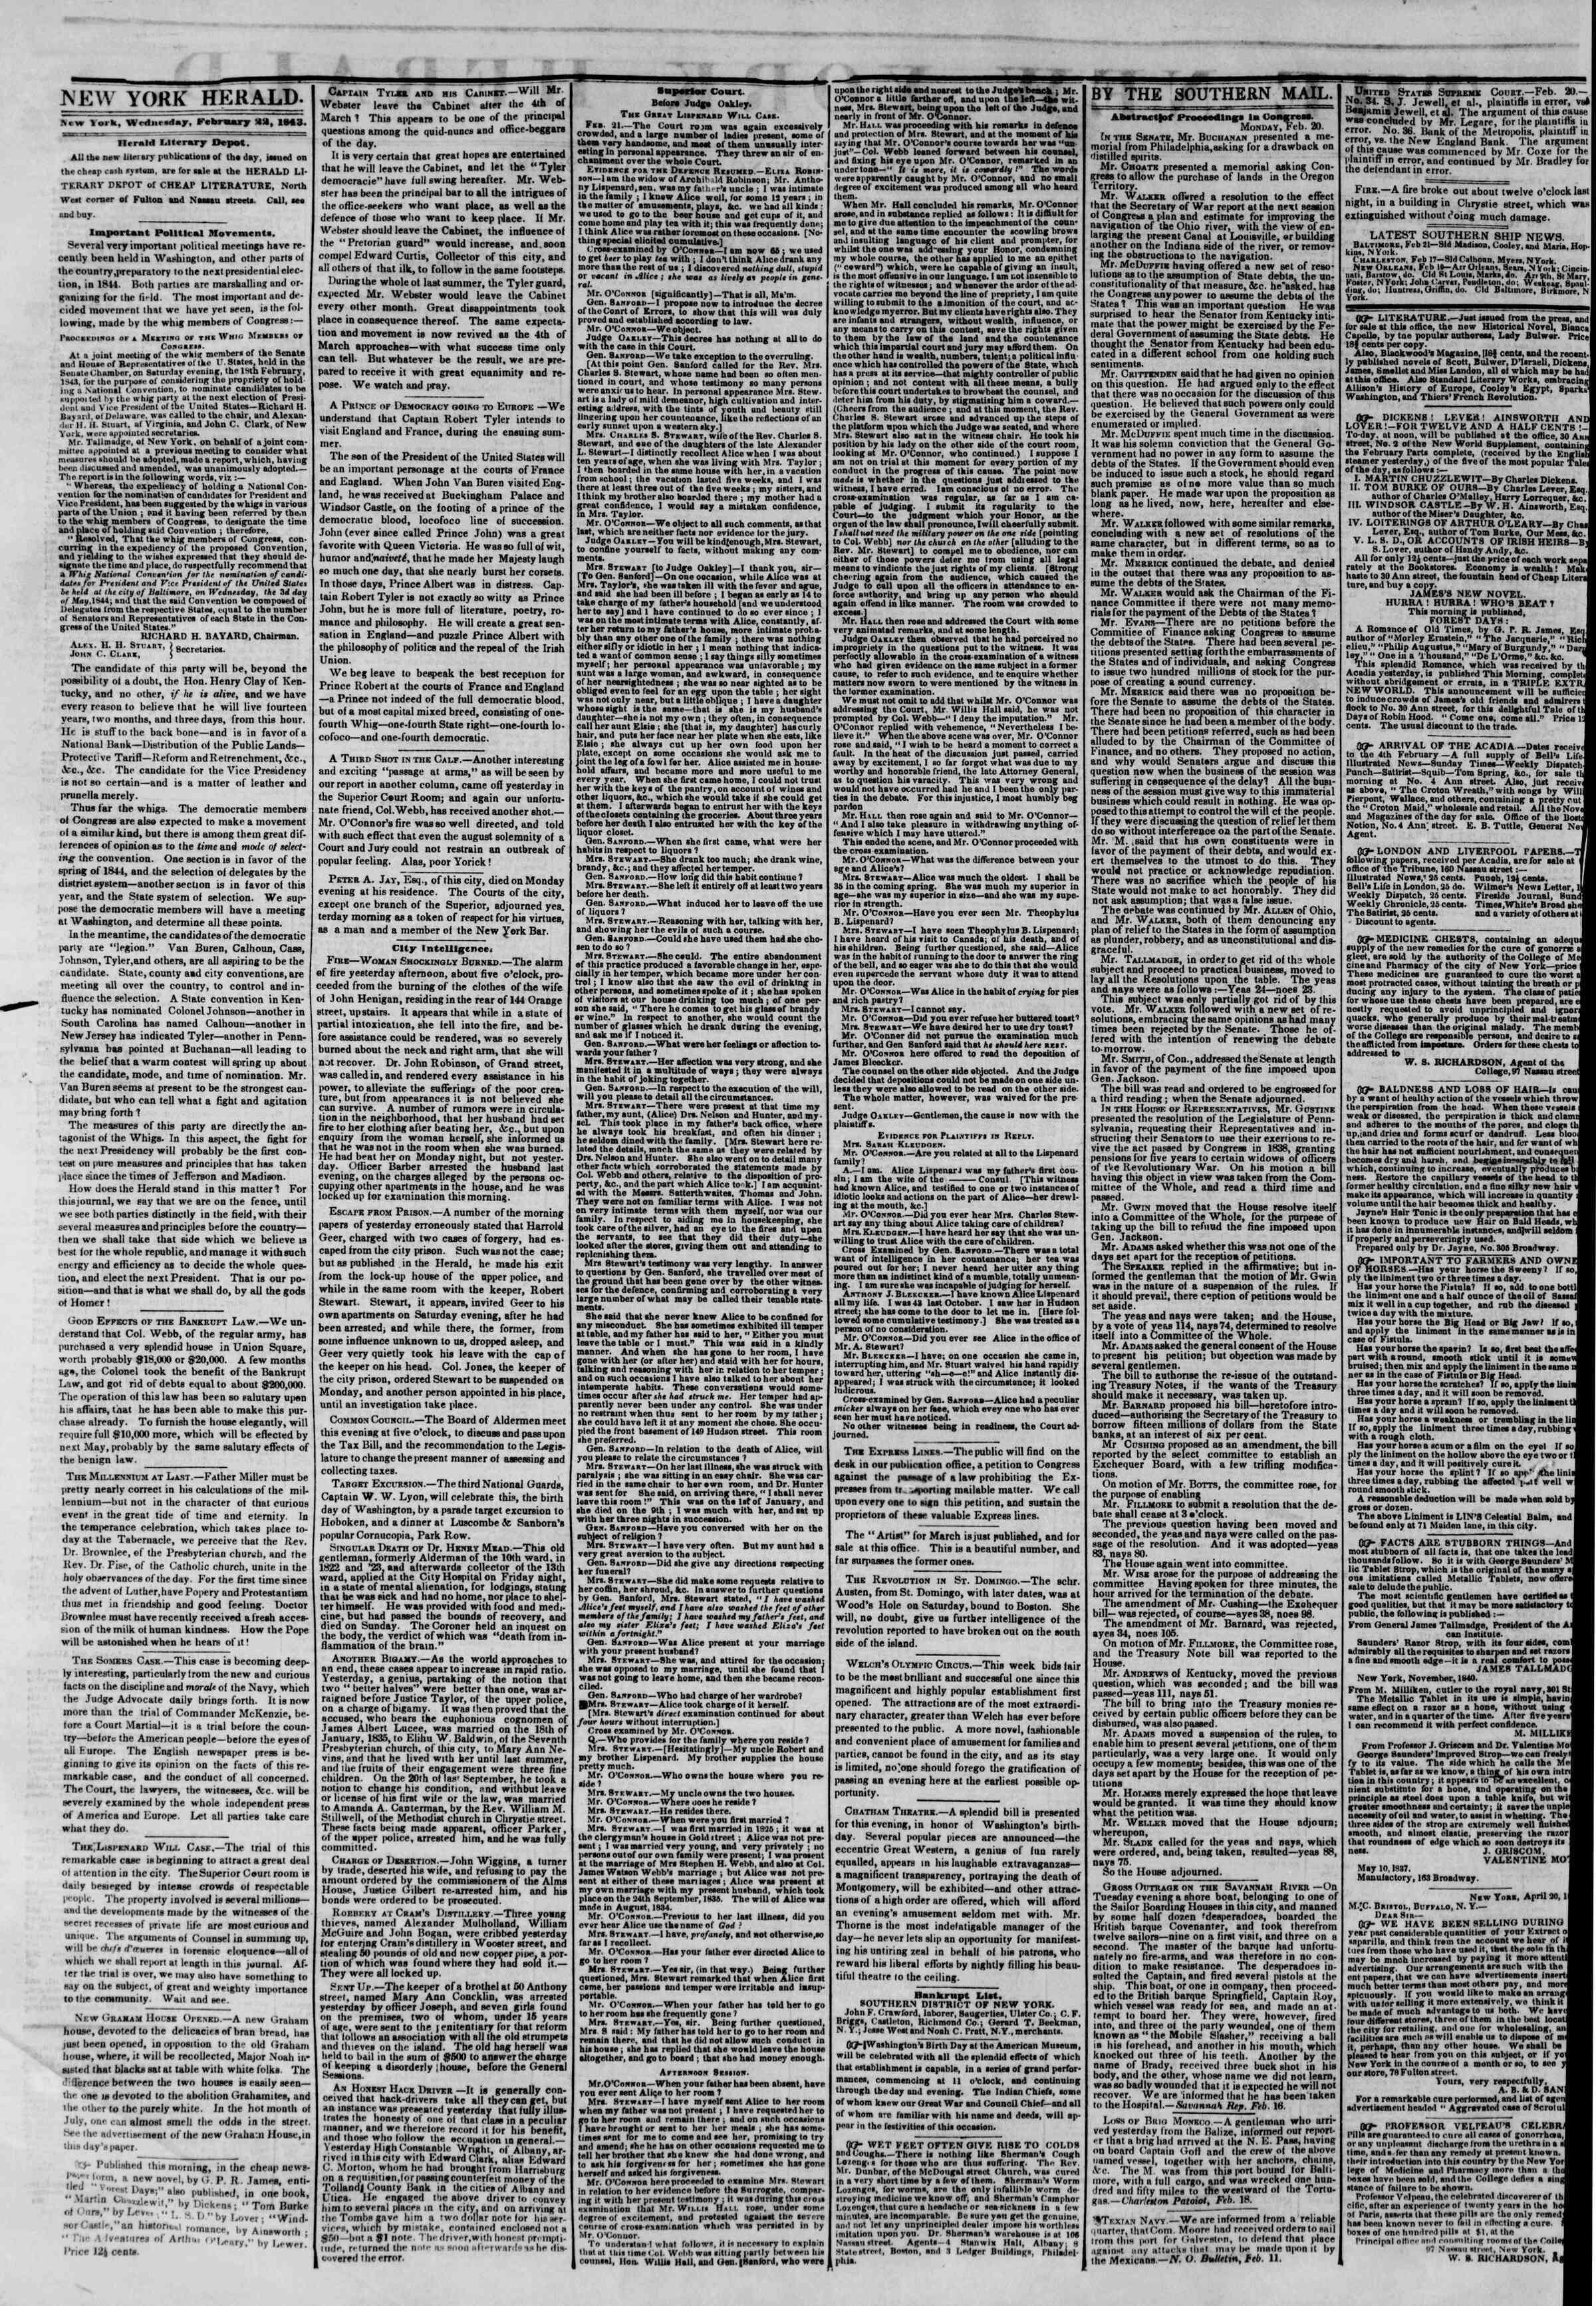 February 22, 1843 Tarihli The New York Herald Gazetesi Sayfa 2